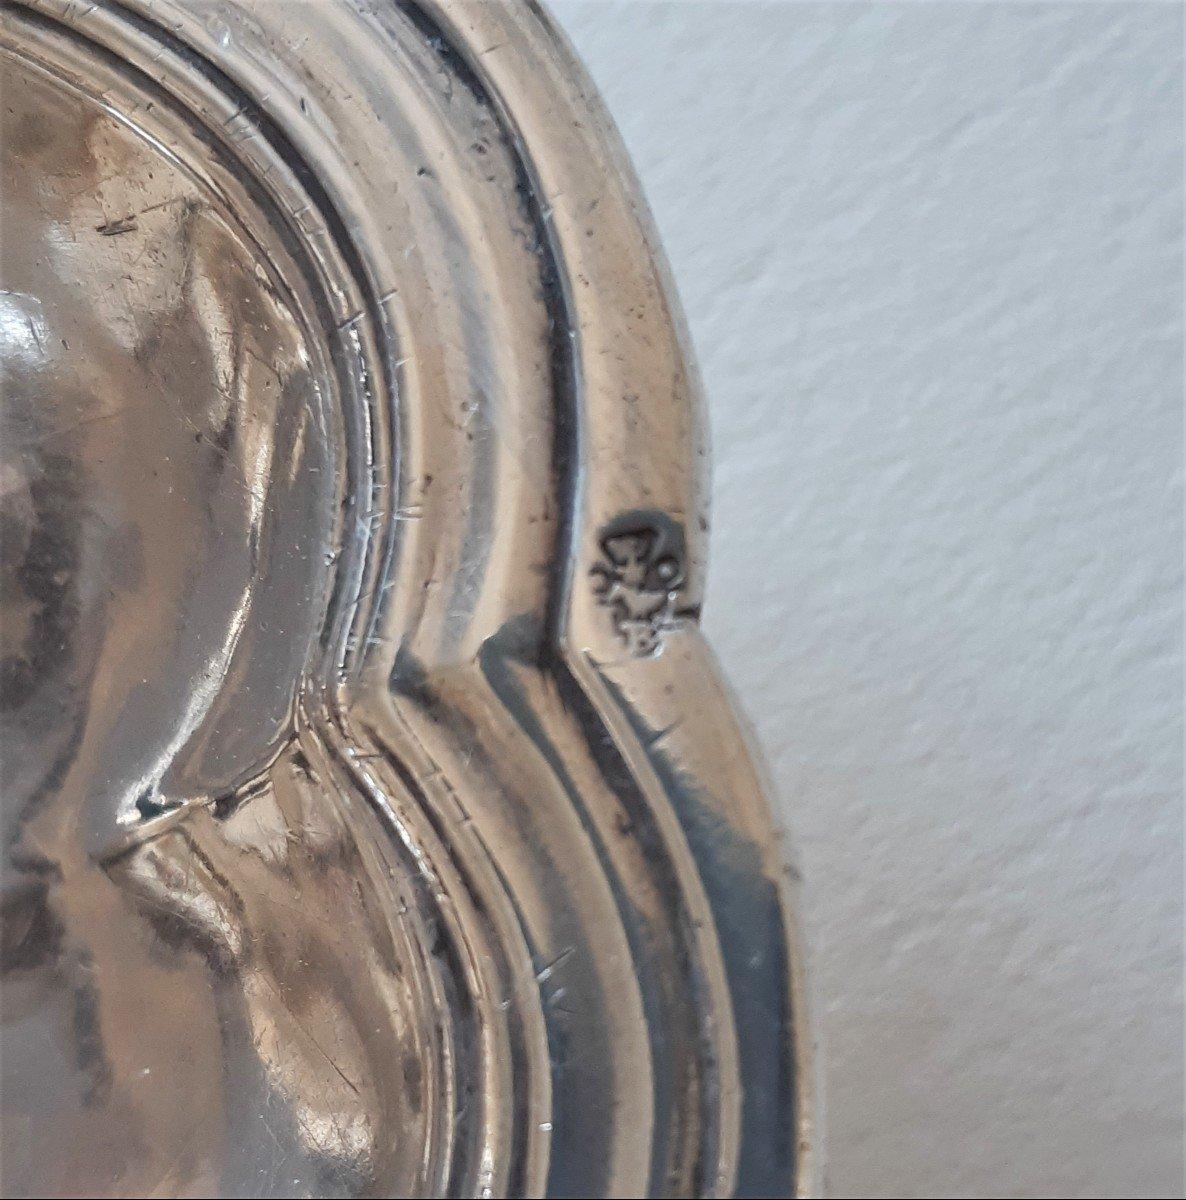 Dish, Sterling Silver By Jean-antoine Bourguet, Paris, 1760-1761-photo-1